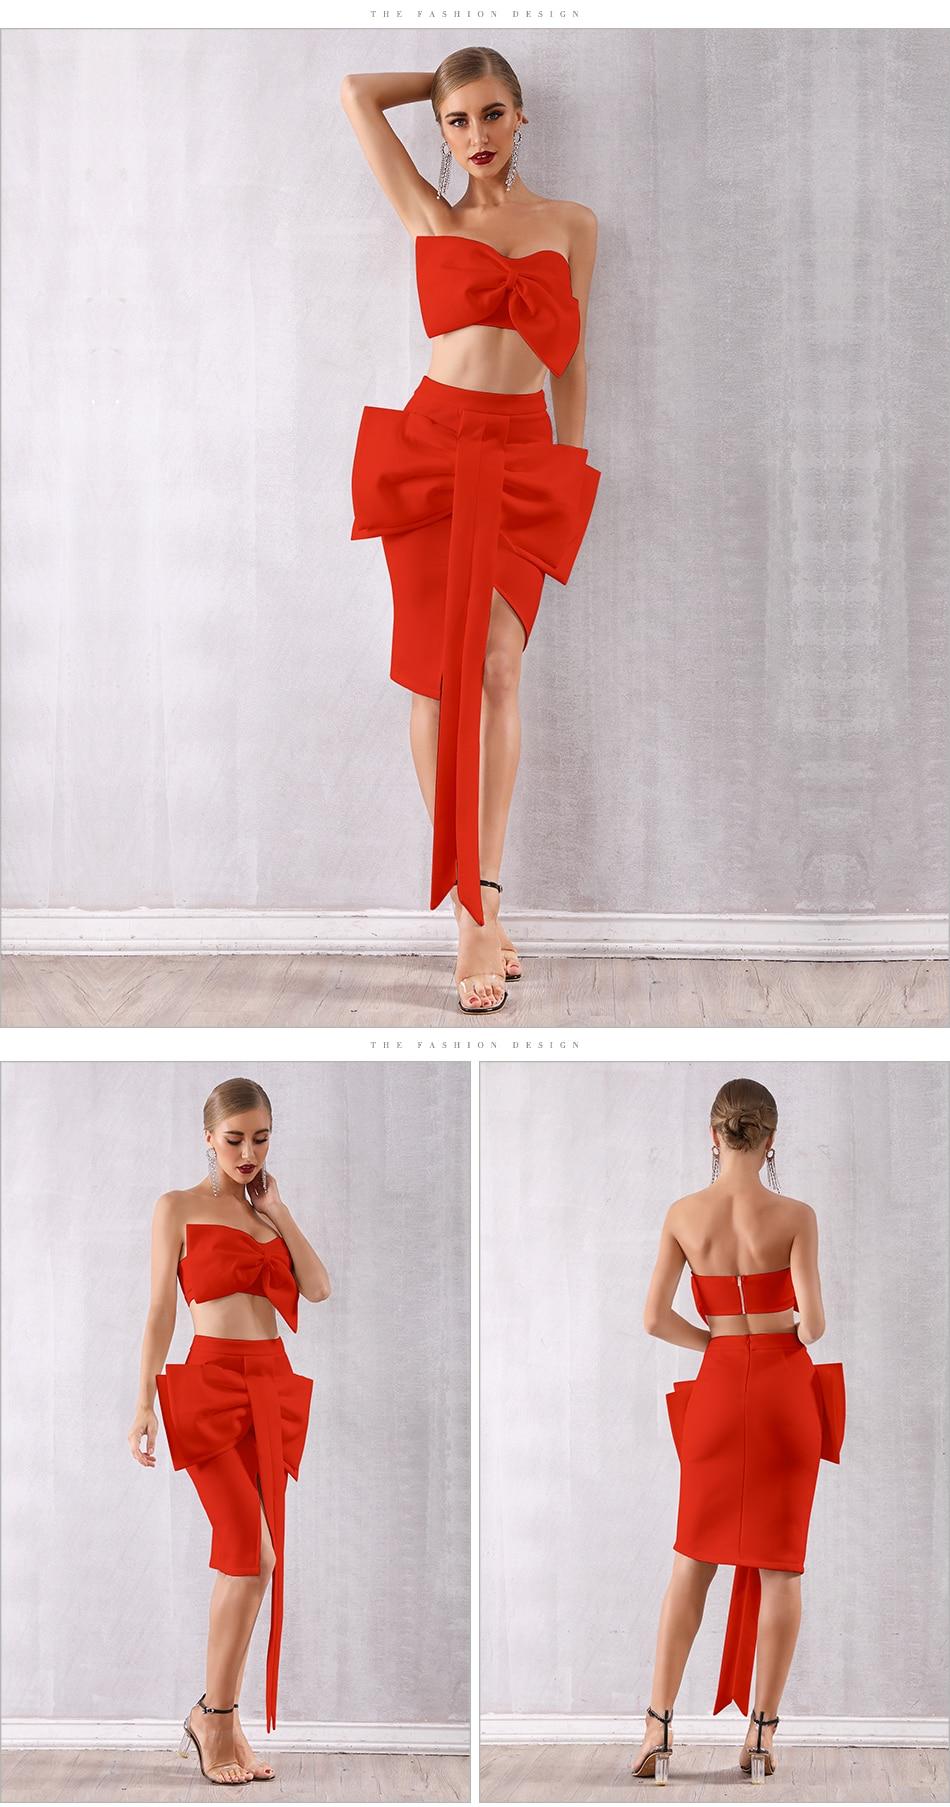 Adyce Celebrity Evening Party Dress Women 19 Sexy Bodycon Sets Strapless Ruffles Sleeveless Bow Red Black Club Dress Vestidos 9